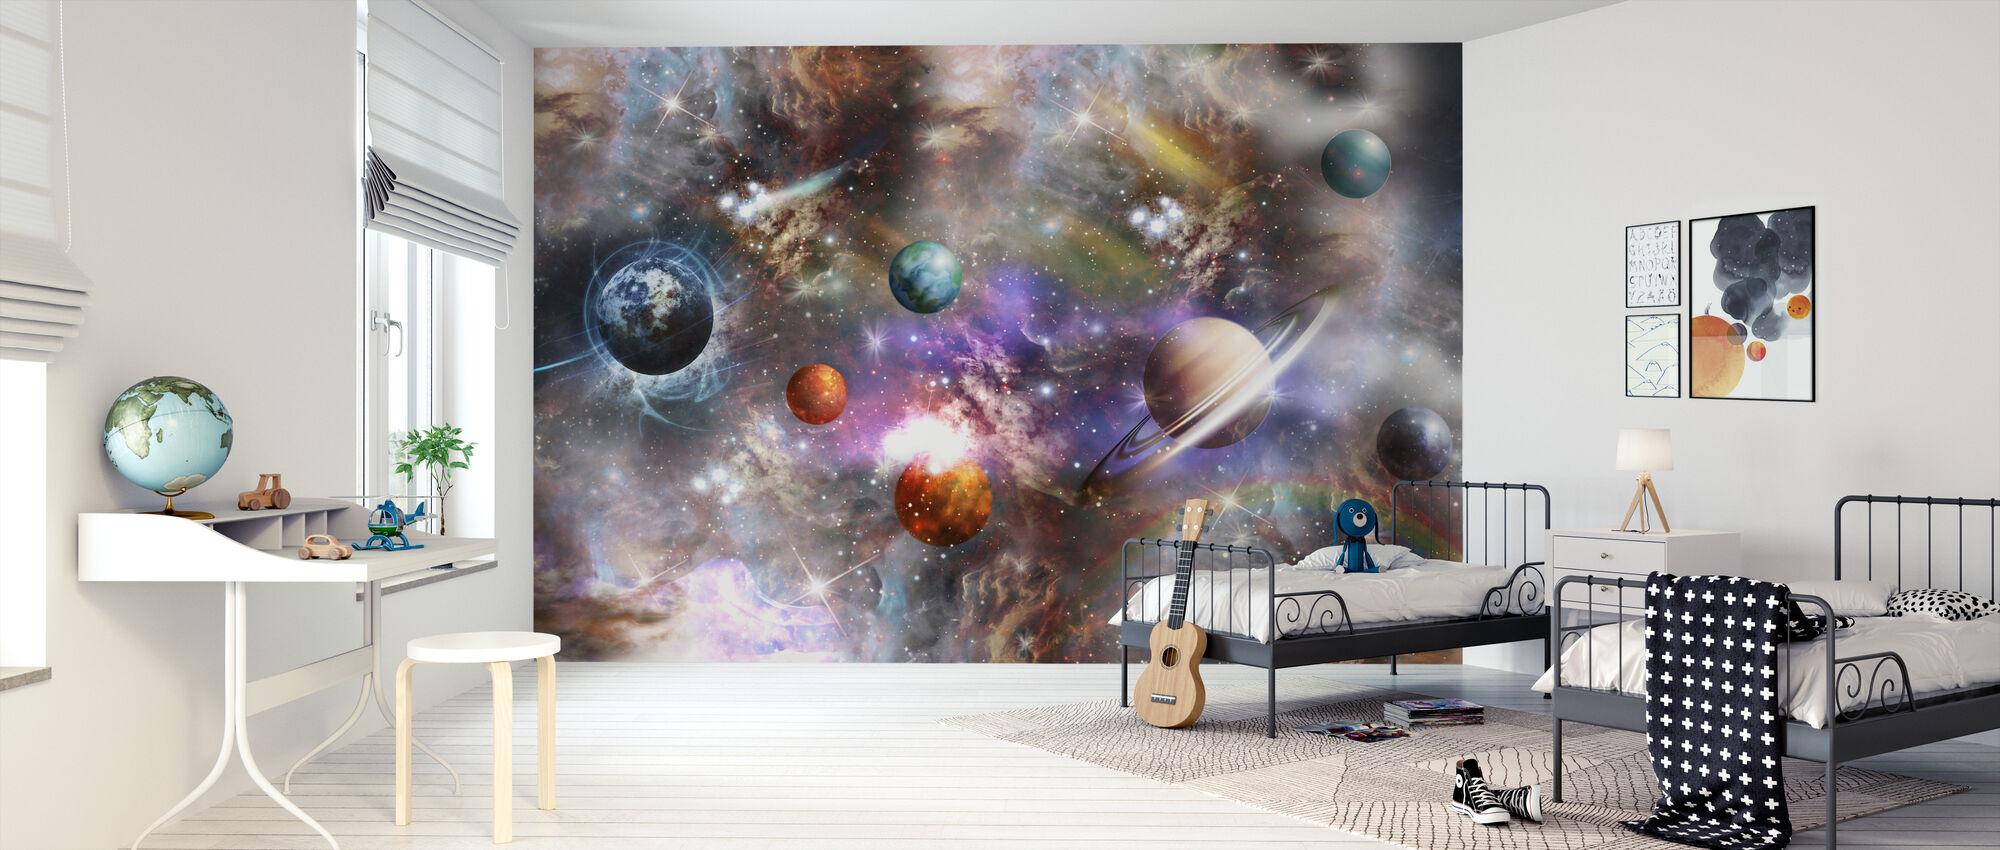 Levendige ruimte - Behang - Kinderkamer